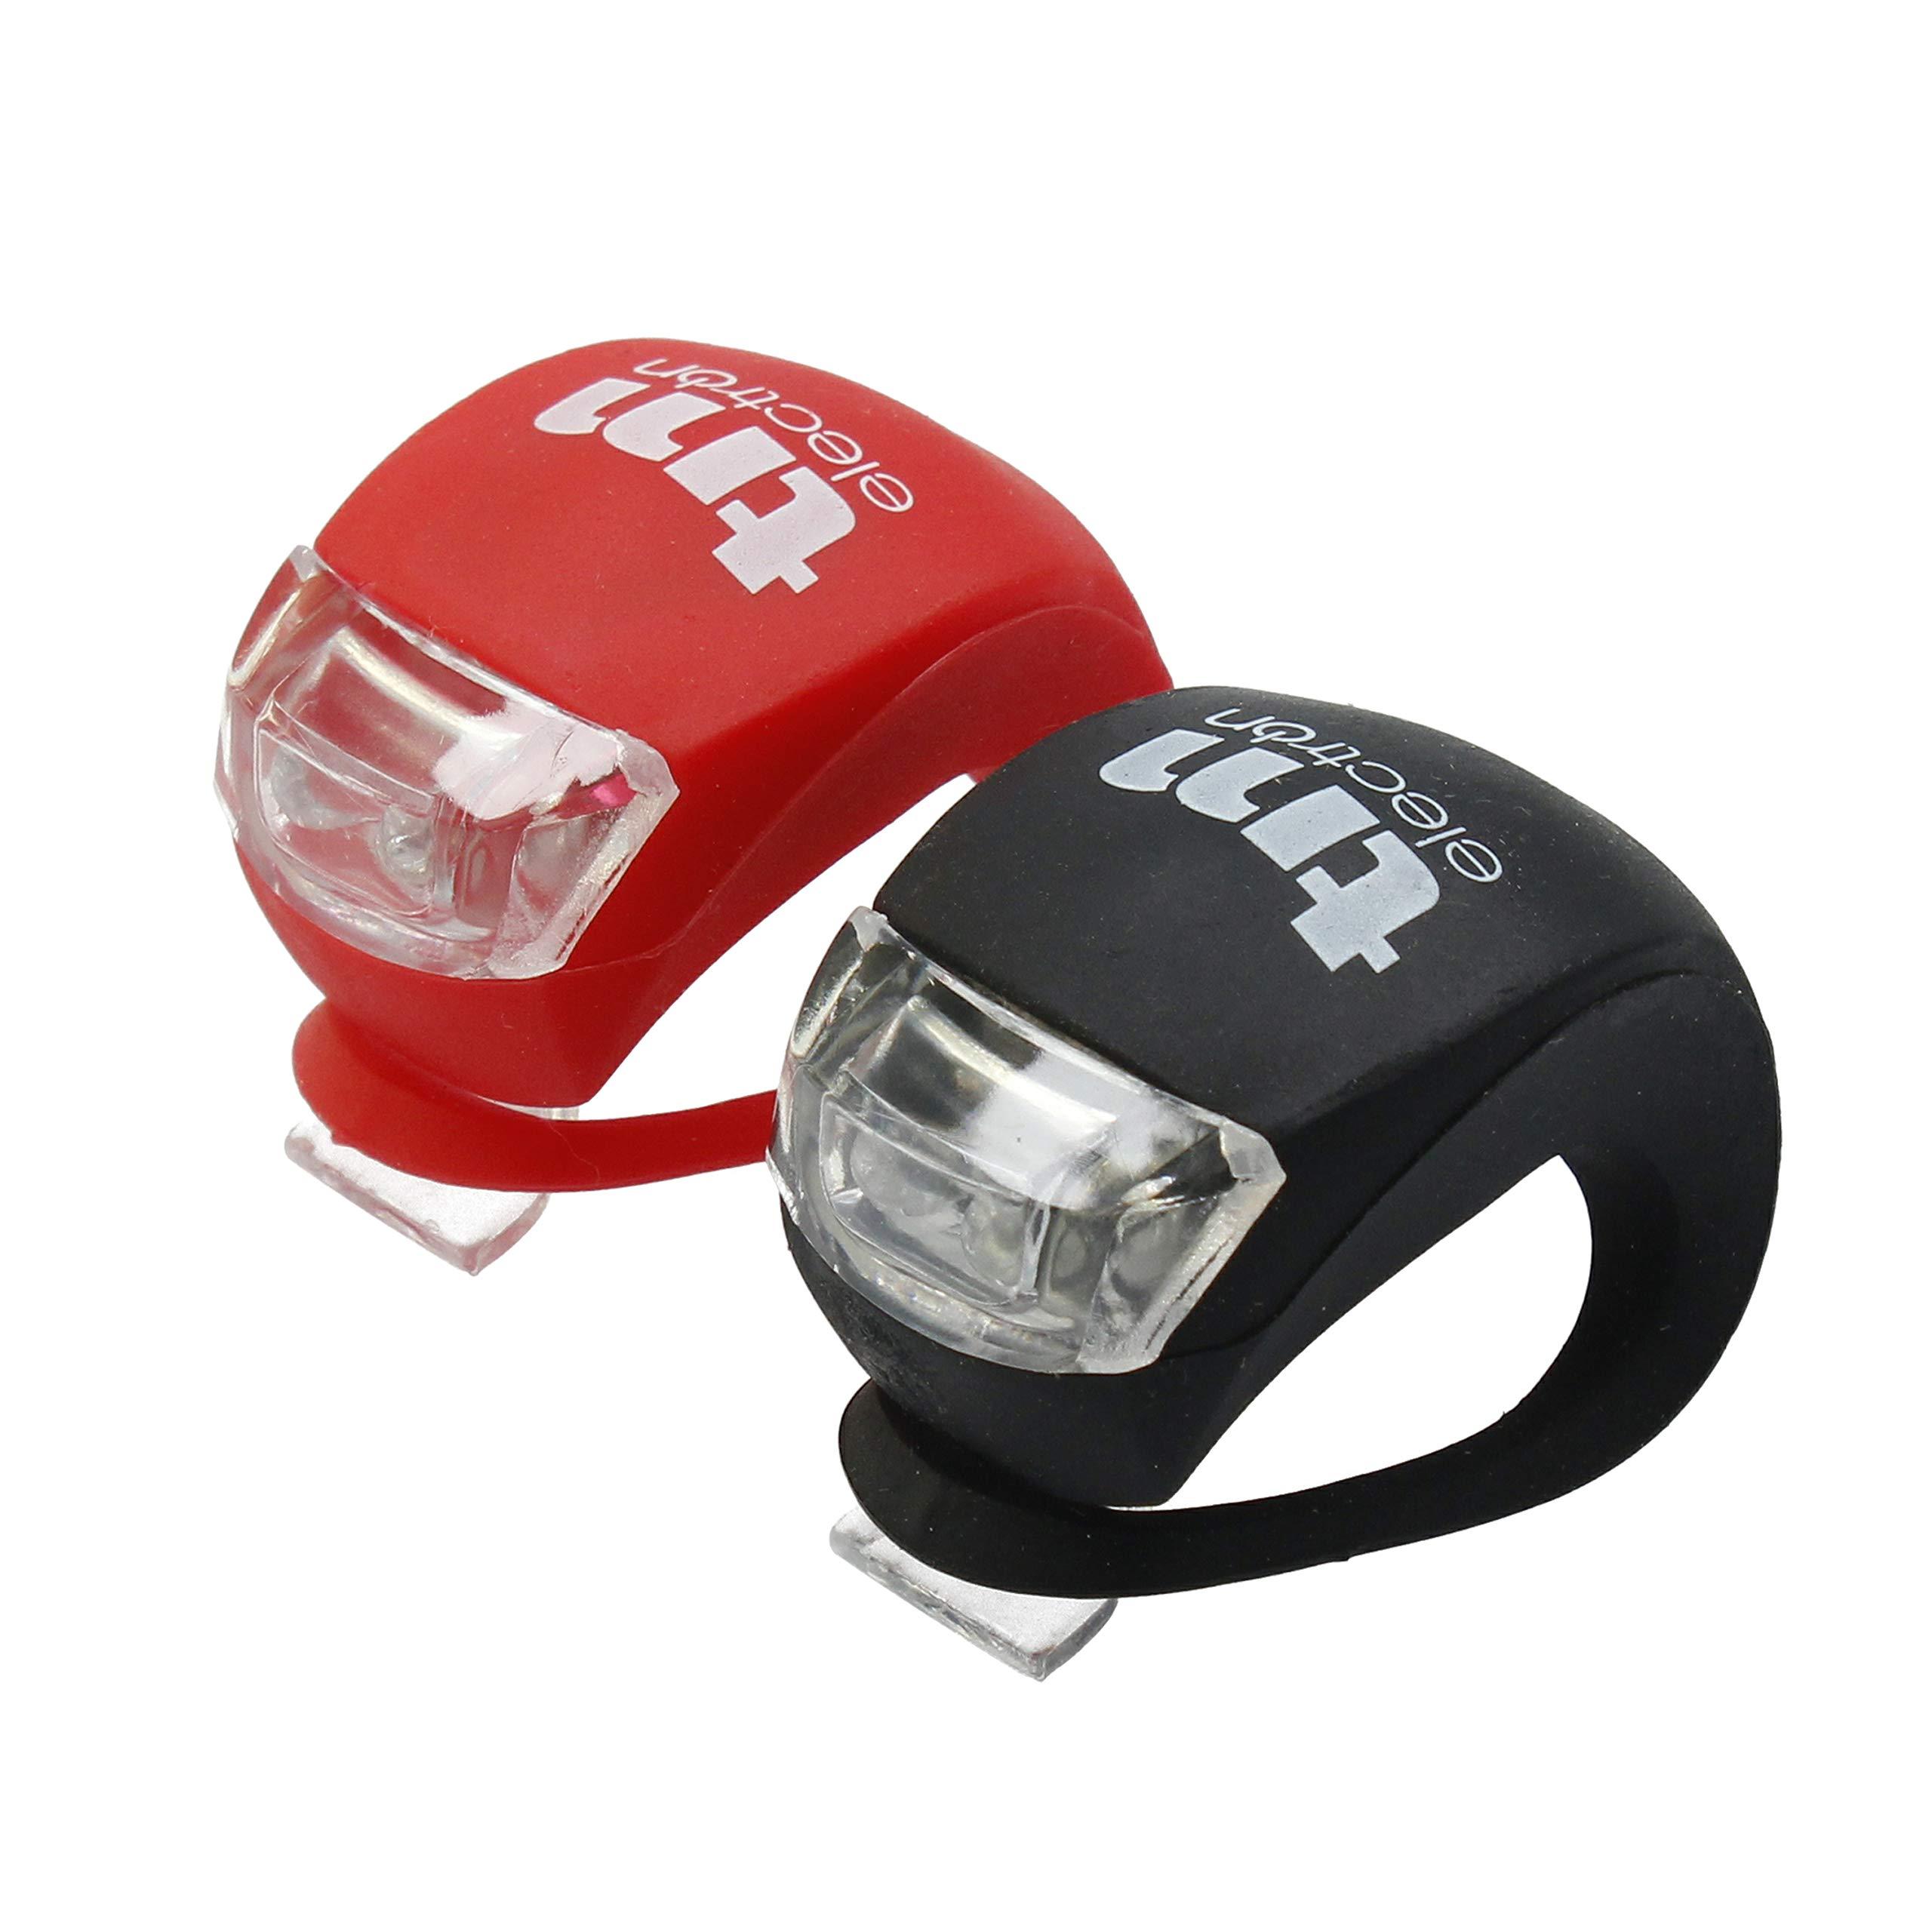 TM Electron TMTOR003 Set de luces LED frontal y trasera de ...